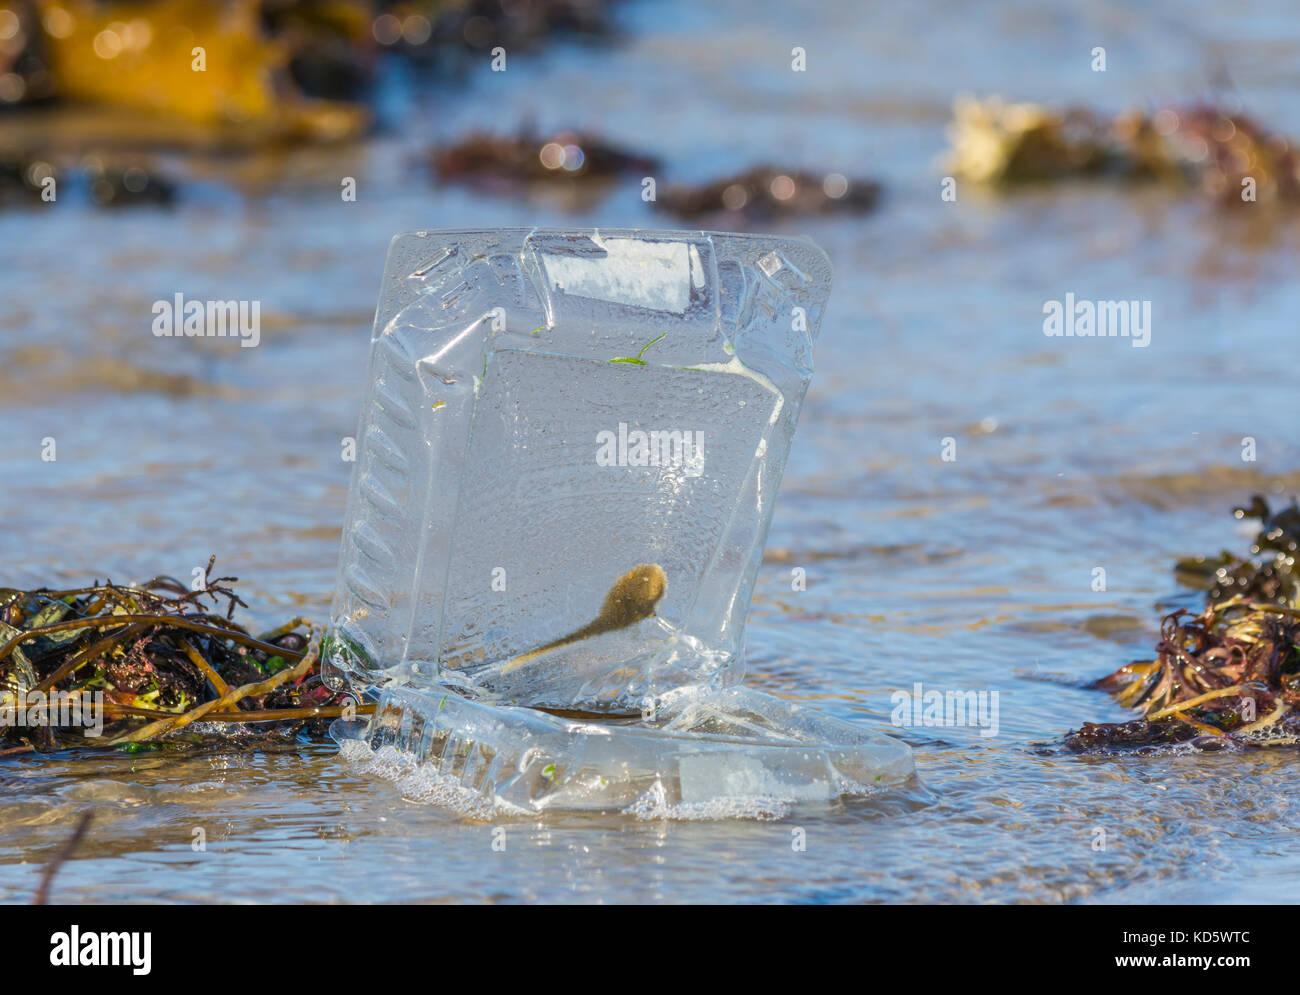 Weggeworfene Lebensmittel aus Kunststoff Behälter an einem Strand am Meer in Großbritannien. Sky Ocean Stockbild